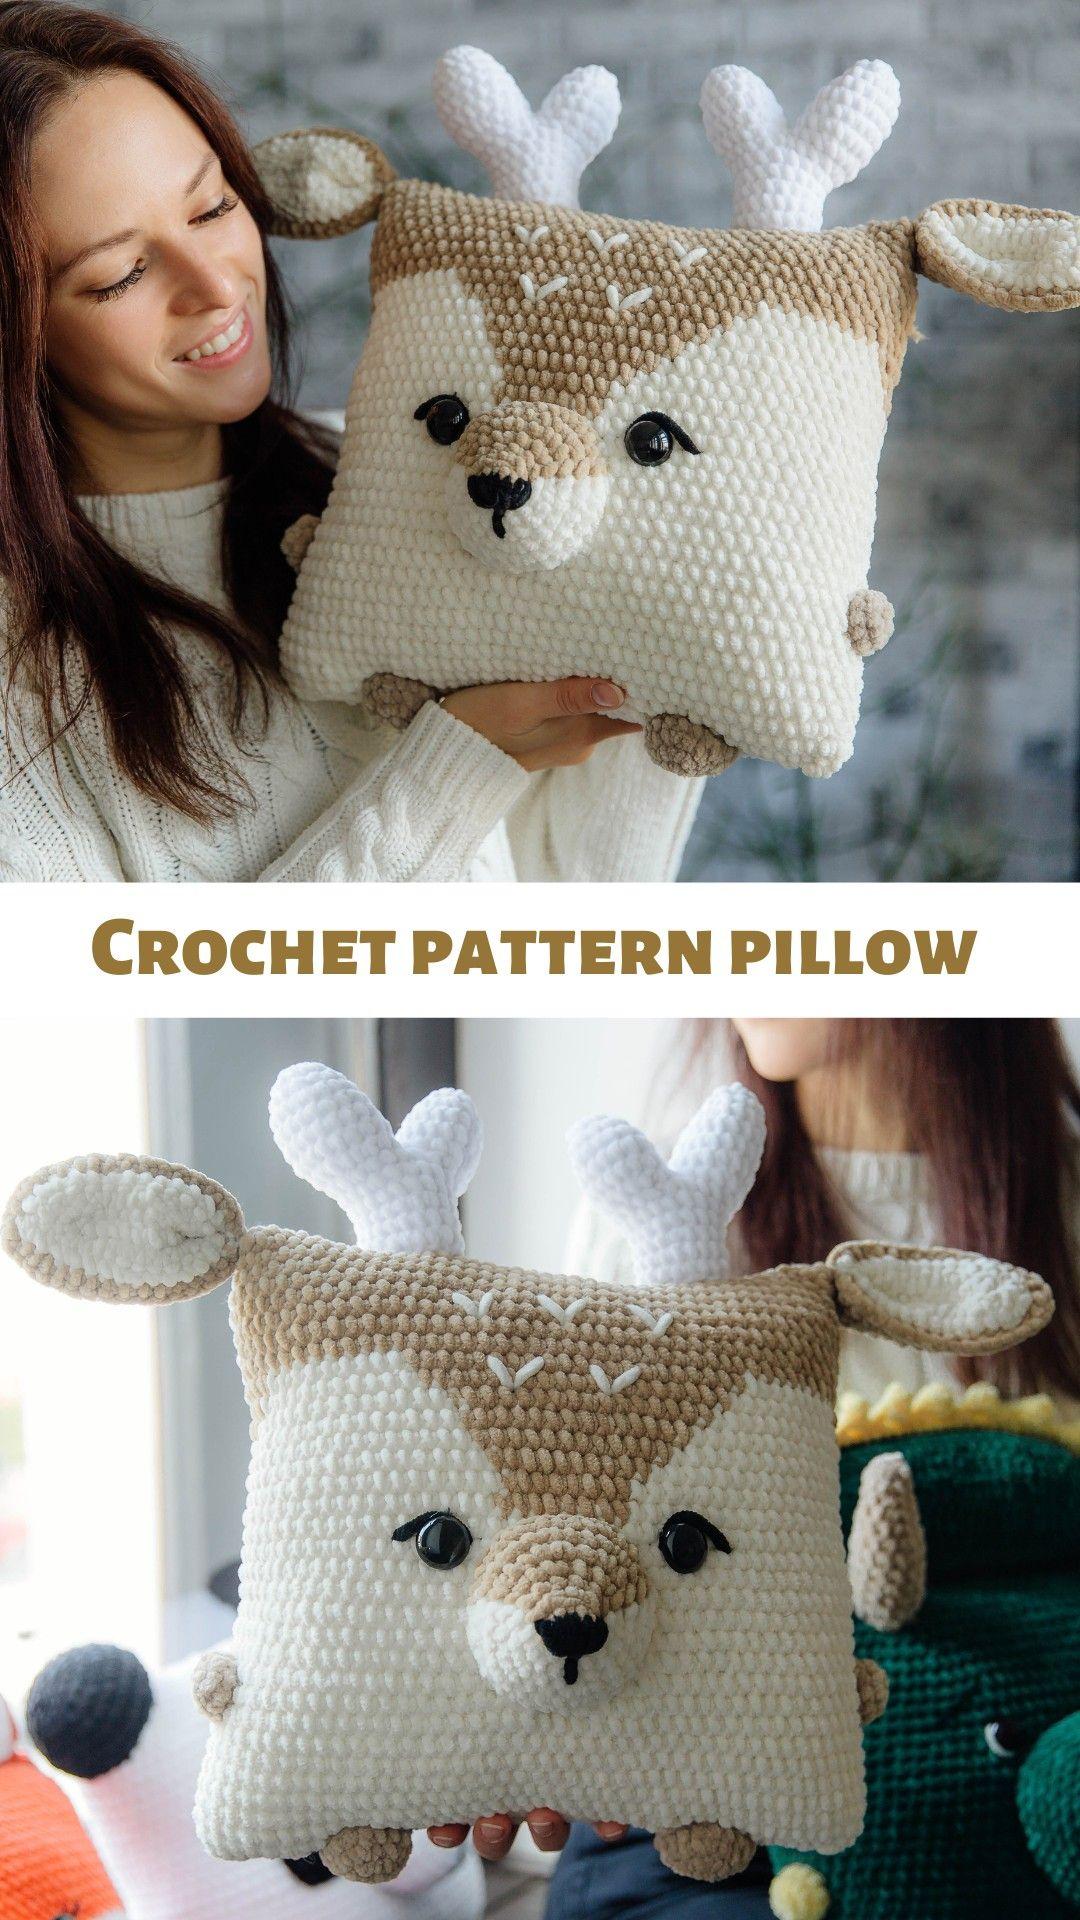 Crochet raindeer pattern, amigurumi deer pattern, crochet deer, christmas deer, crochet pillow, toy